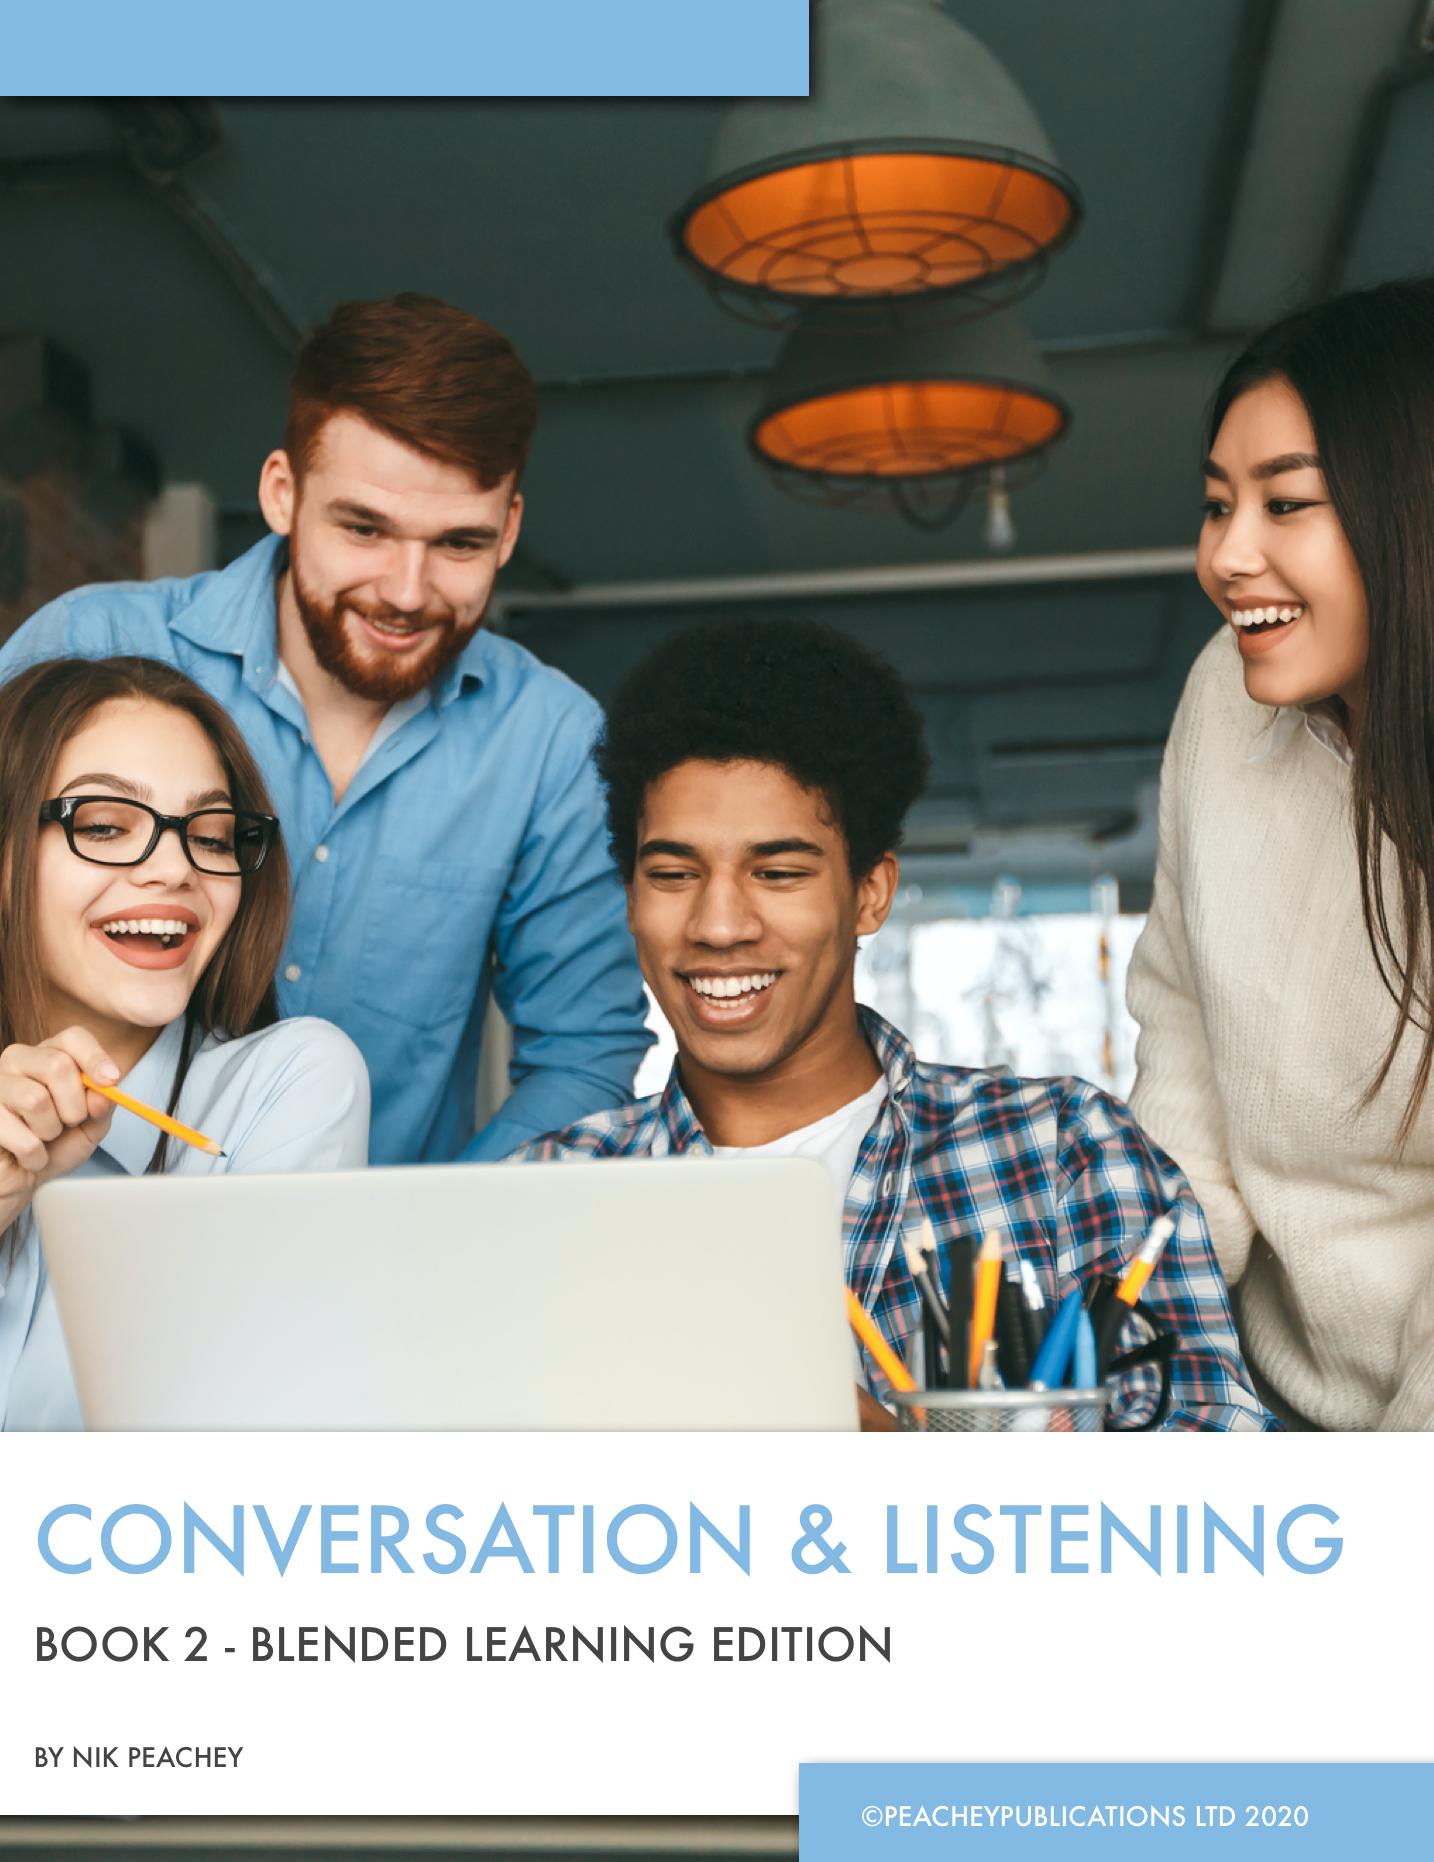 Book Cover - Conversation & Listening - Book 2